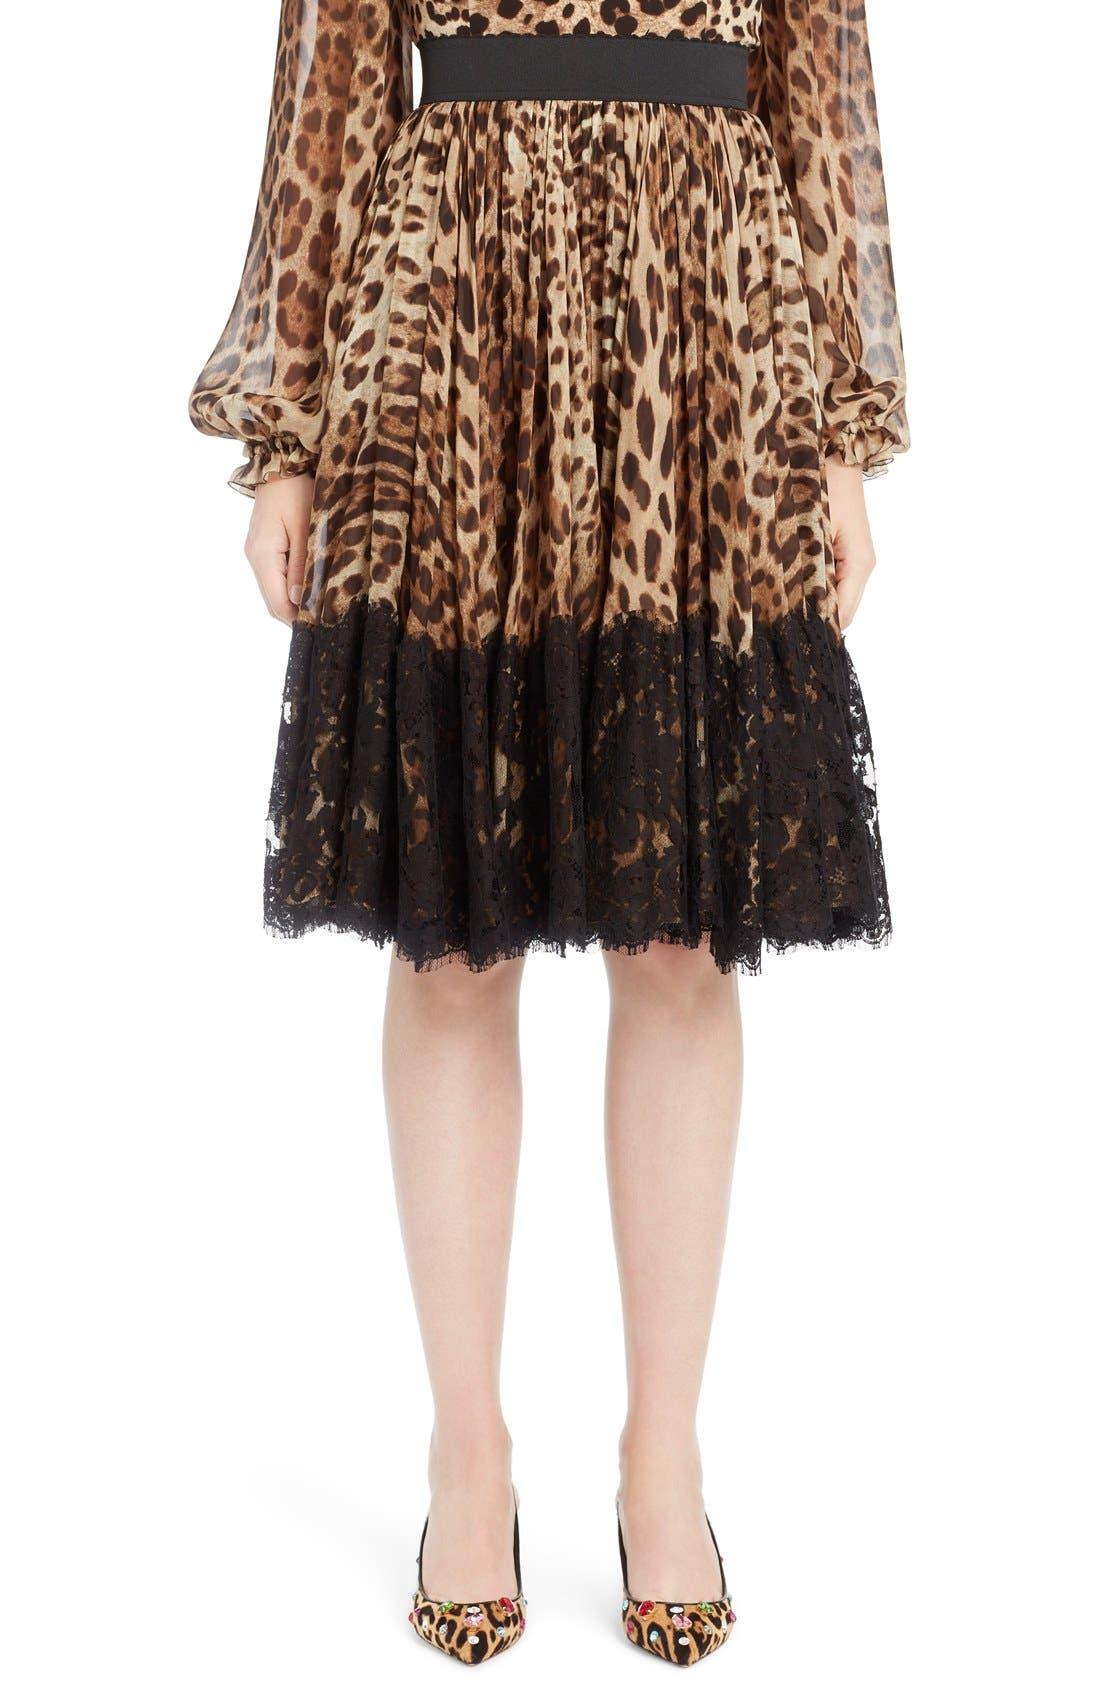 Main Image - Dolce&Gabbana Lace Overlay Leopard Print Chiffon Full Skirt